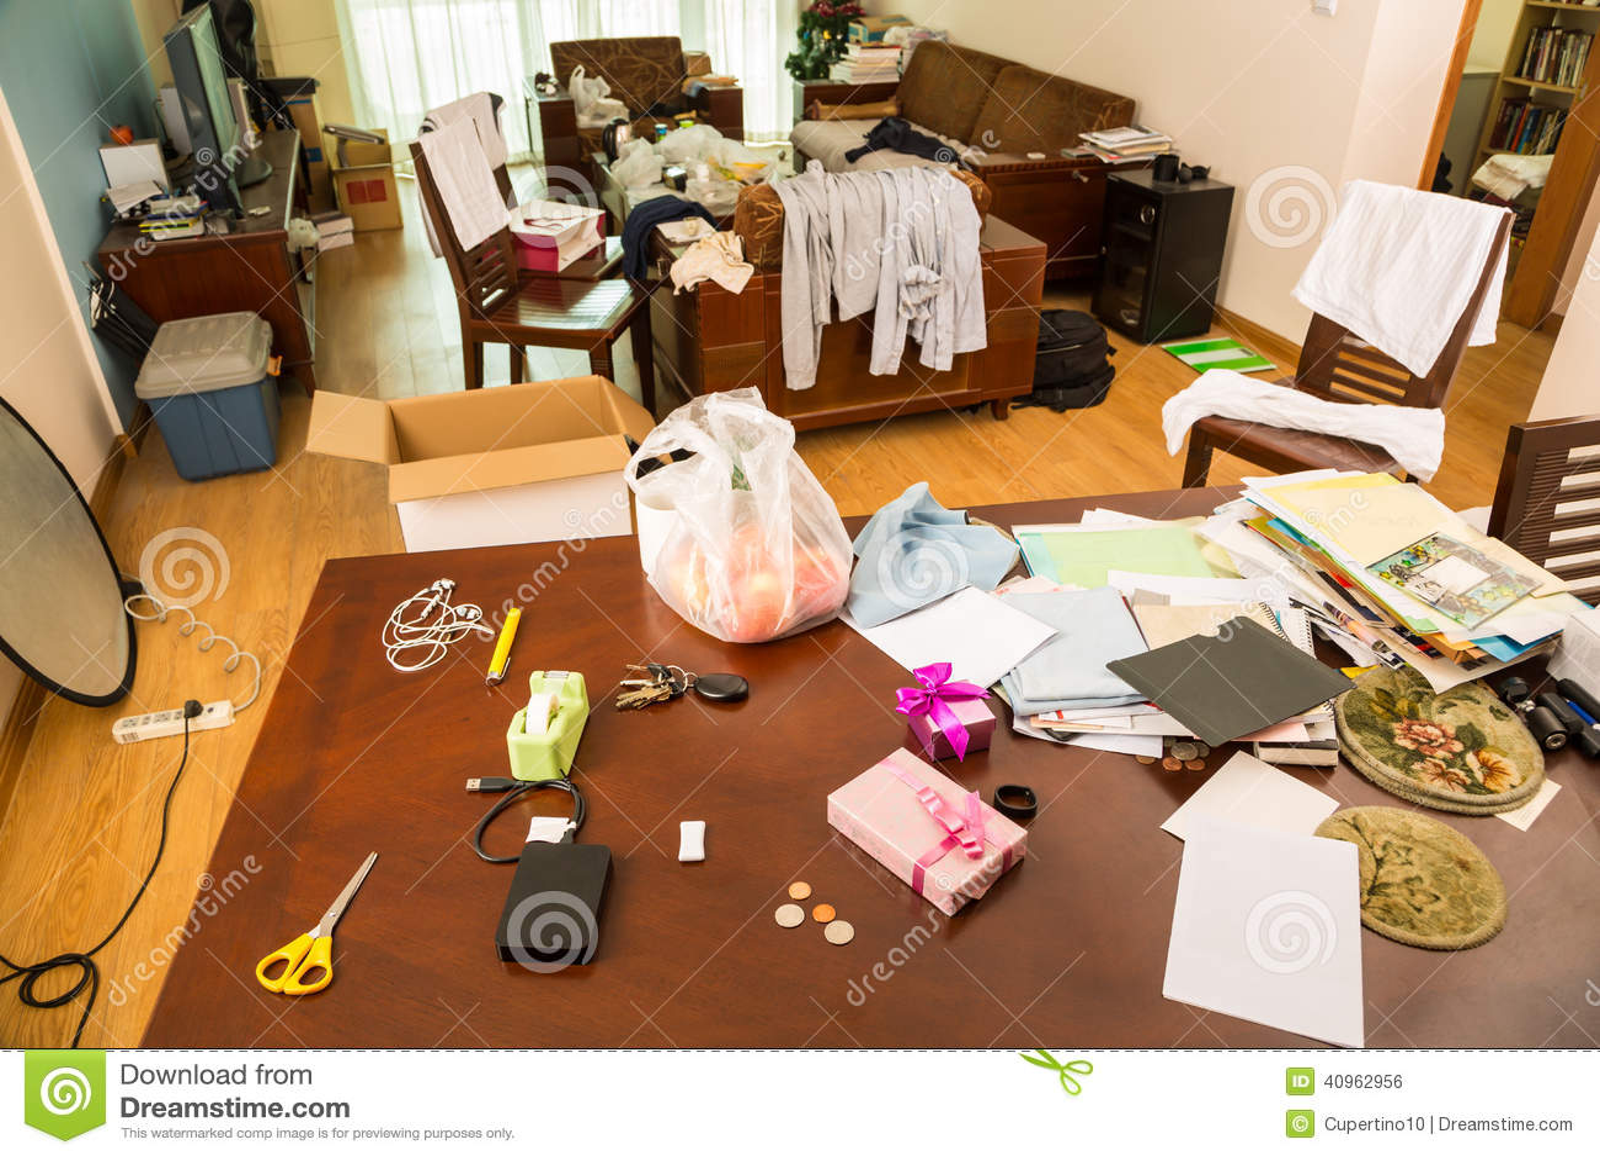 Messy Room Stock Photo Image 40962956